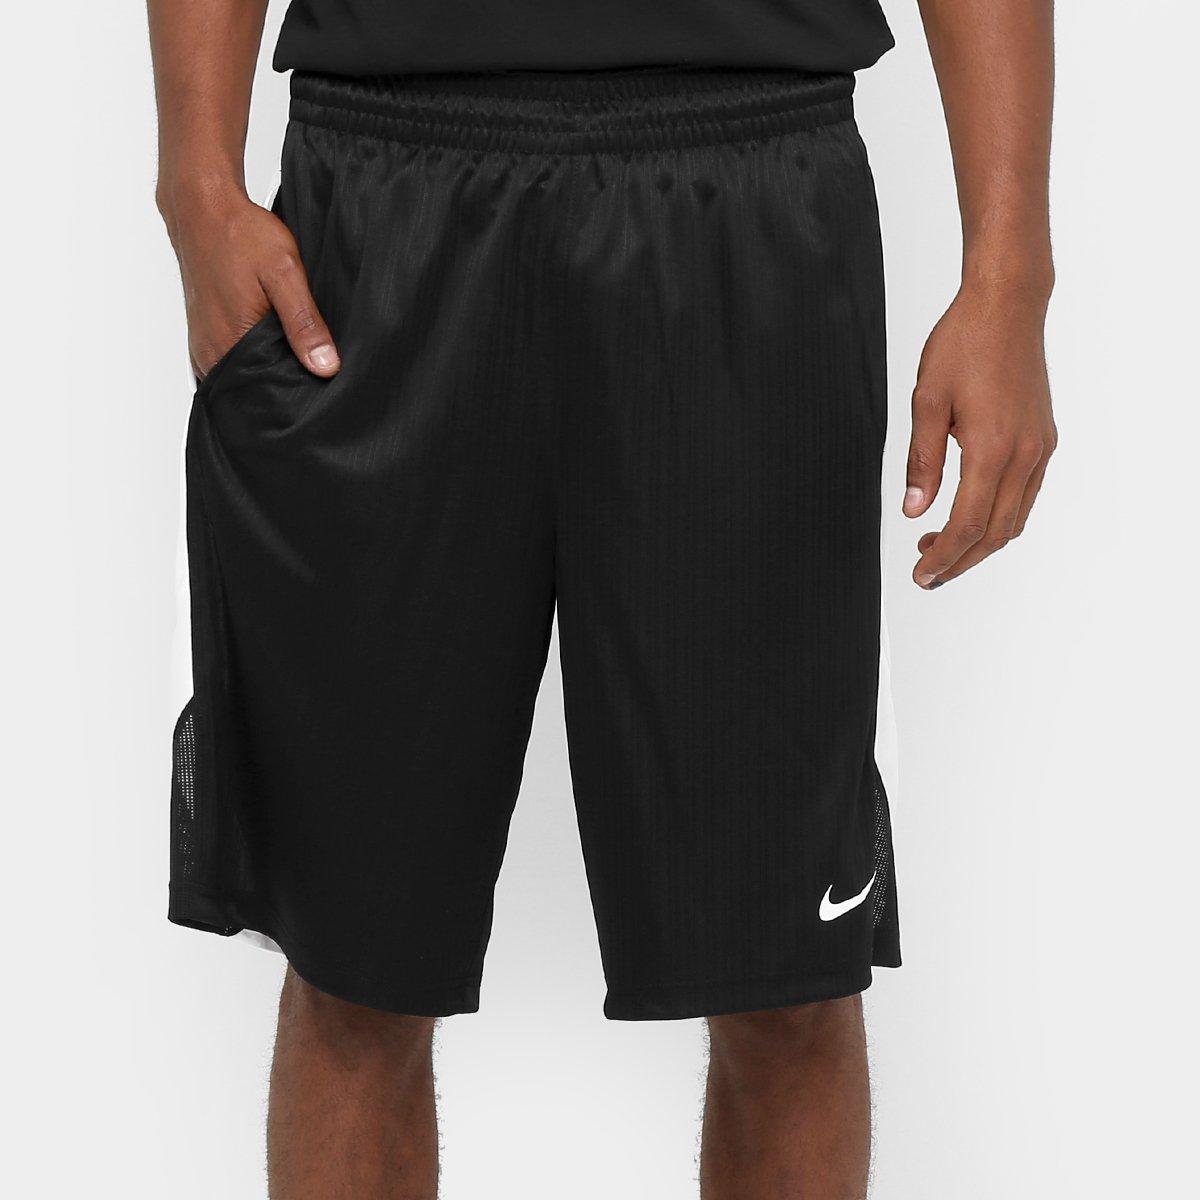 80c2743446 Bermuda Nike Layup 2.0 Masculina - Compre Agora